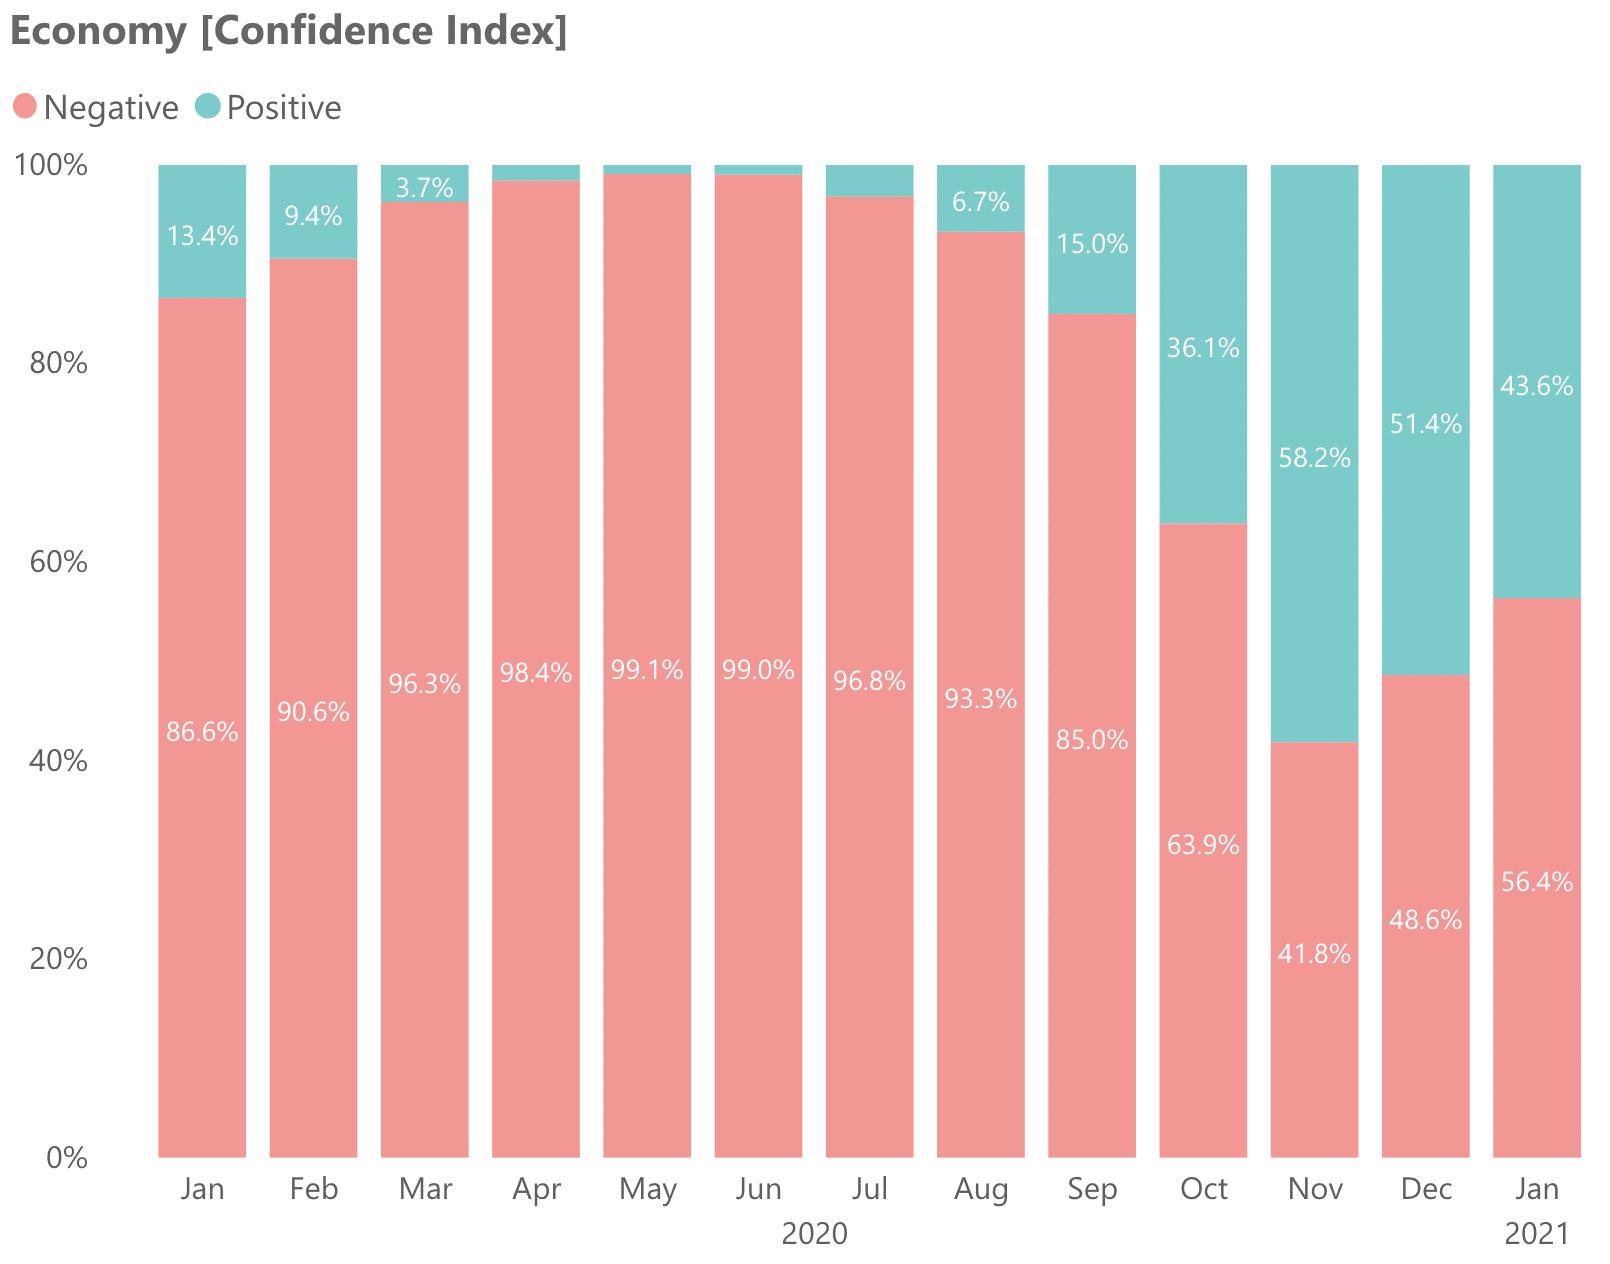 Economy Confidence Index in the UAE